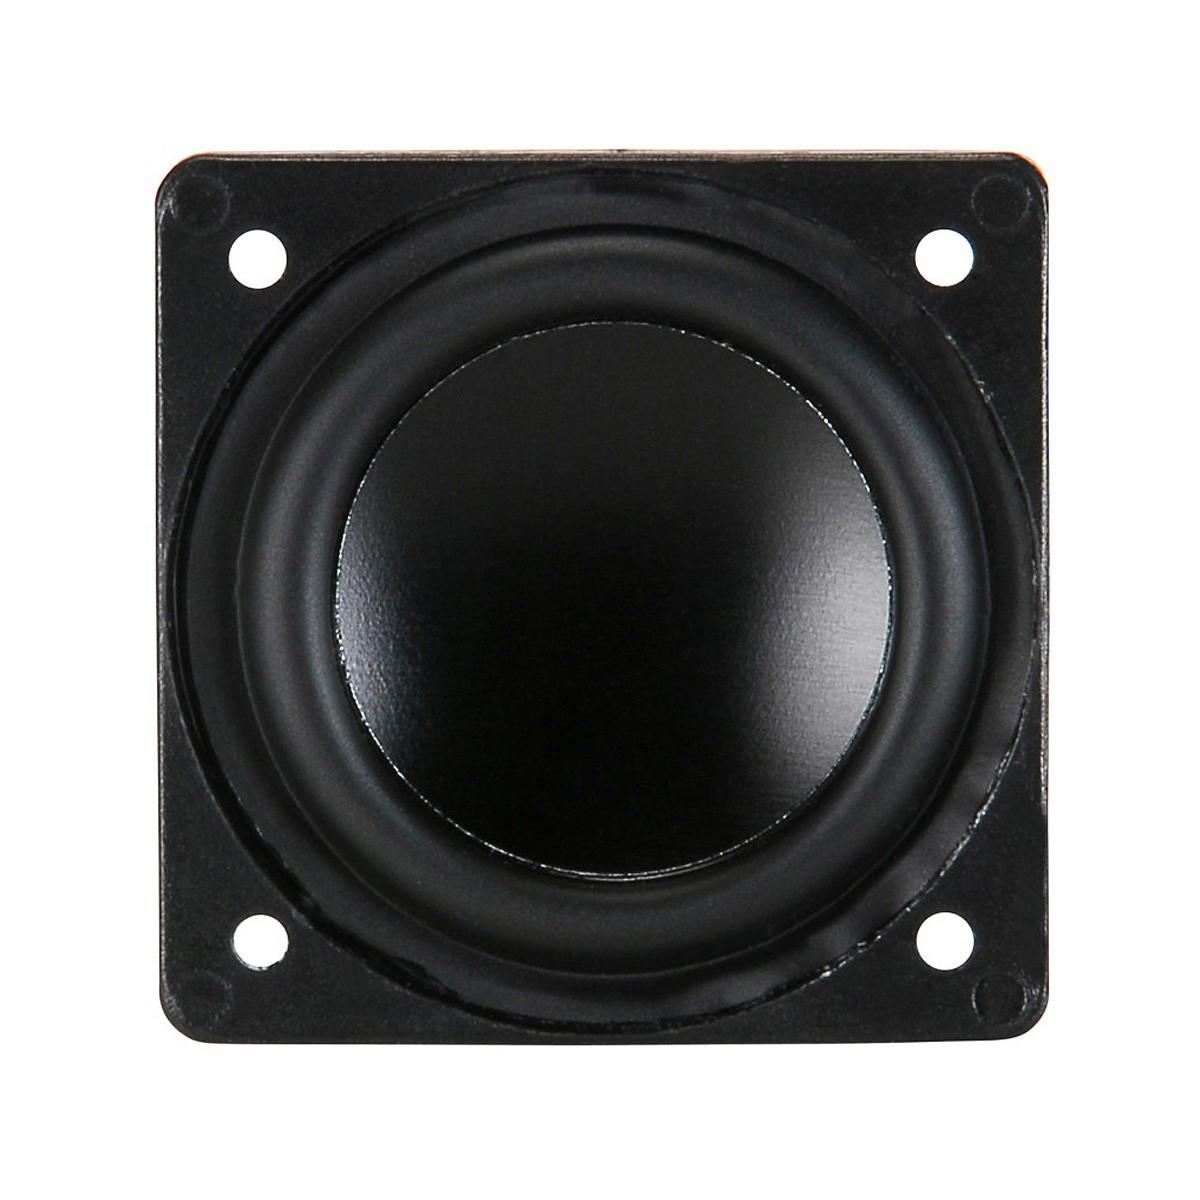 DAYTON AUDIO CE32A-4 Mini Speaker Full Range 4 Ohm Ø 32mm